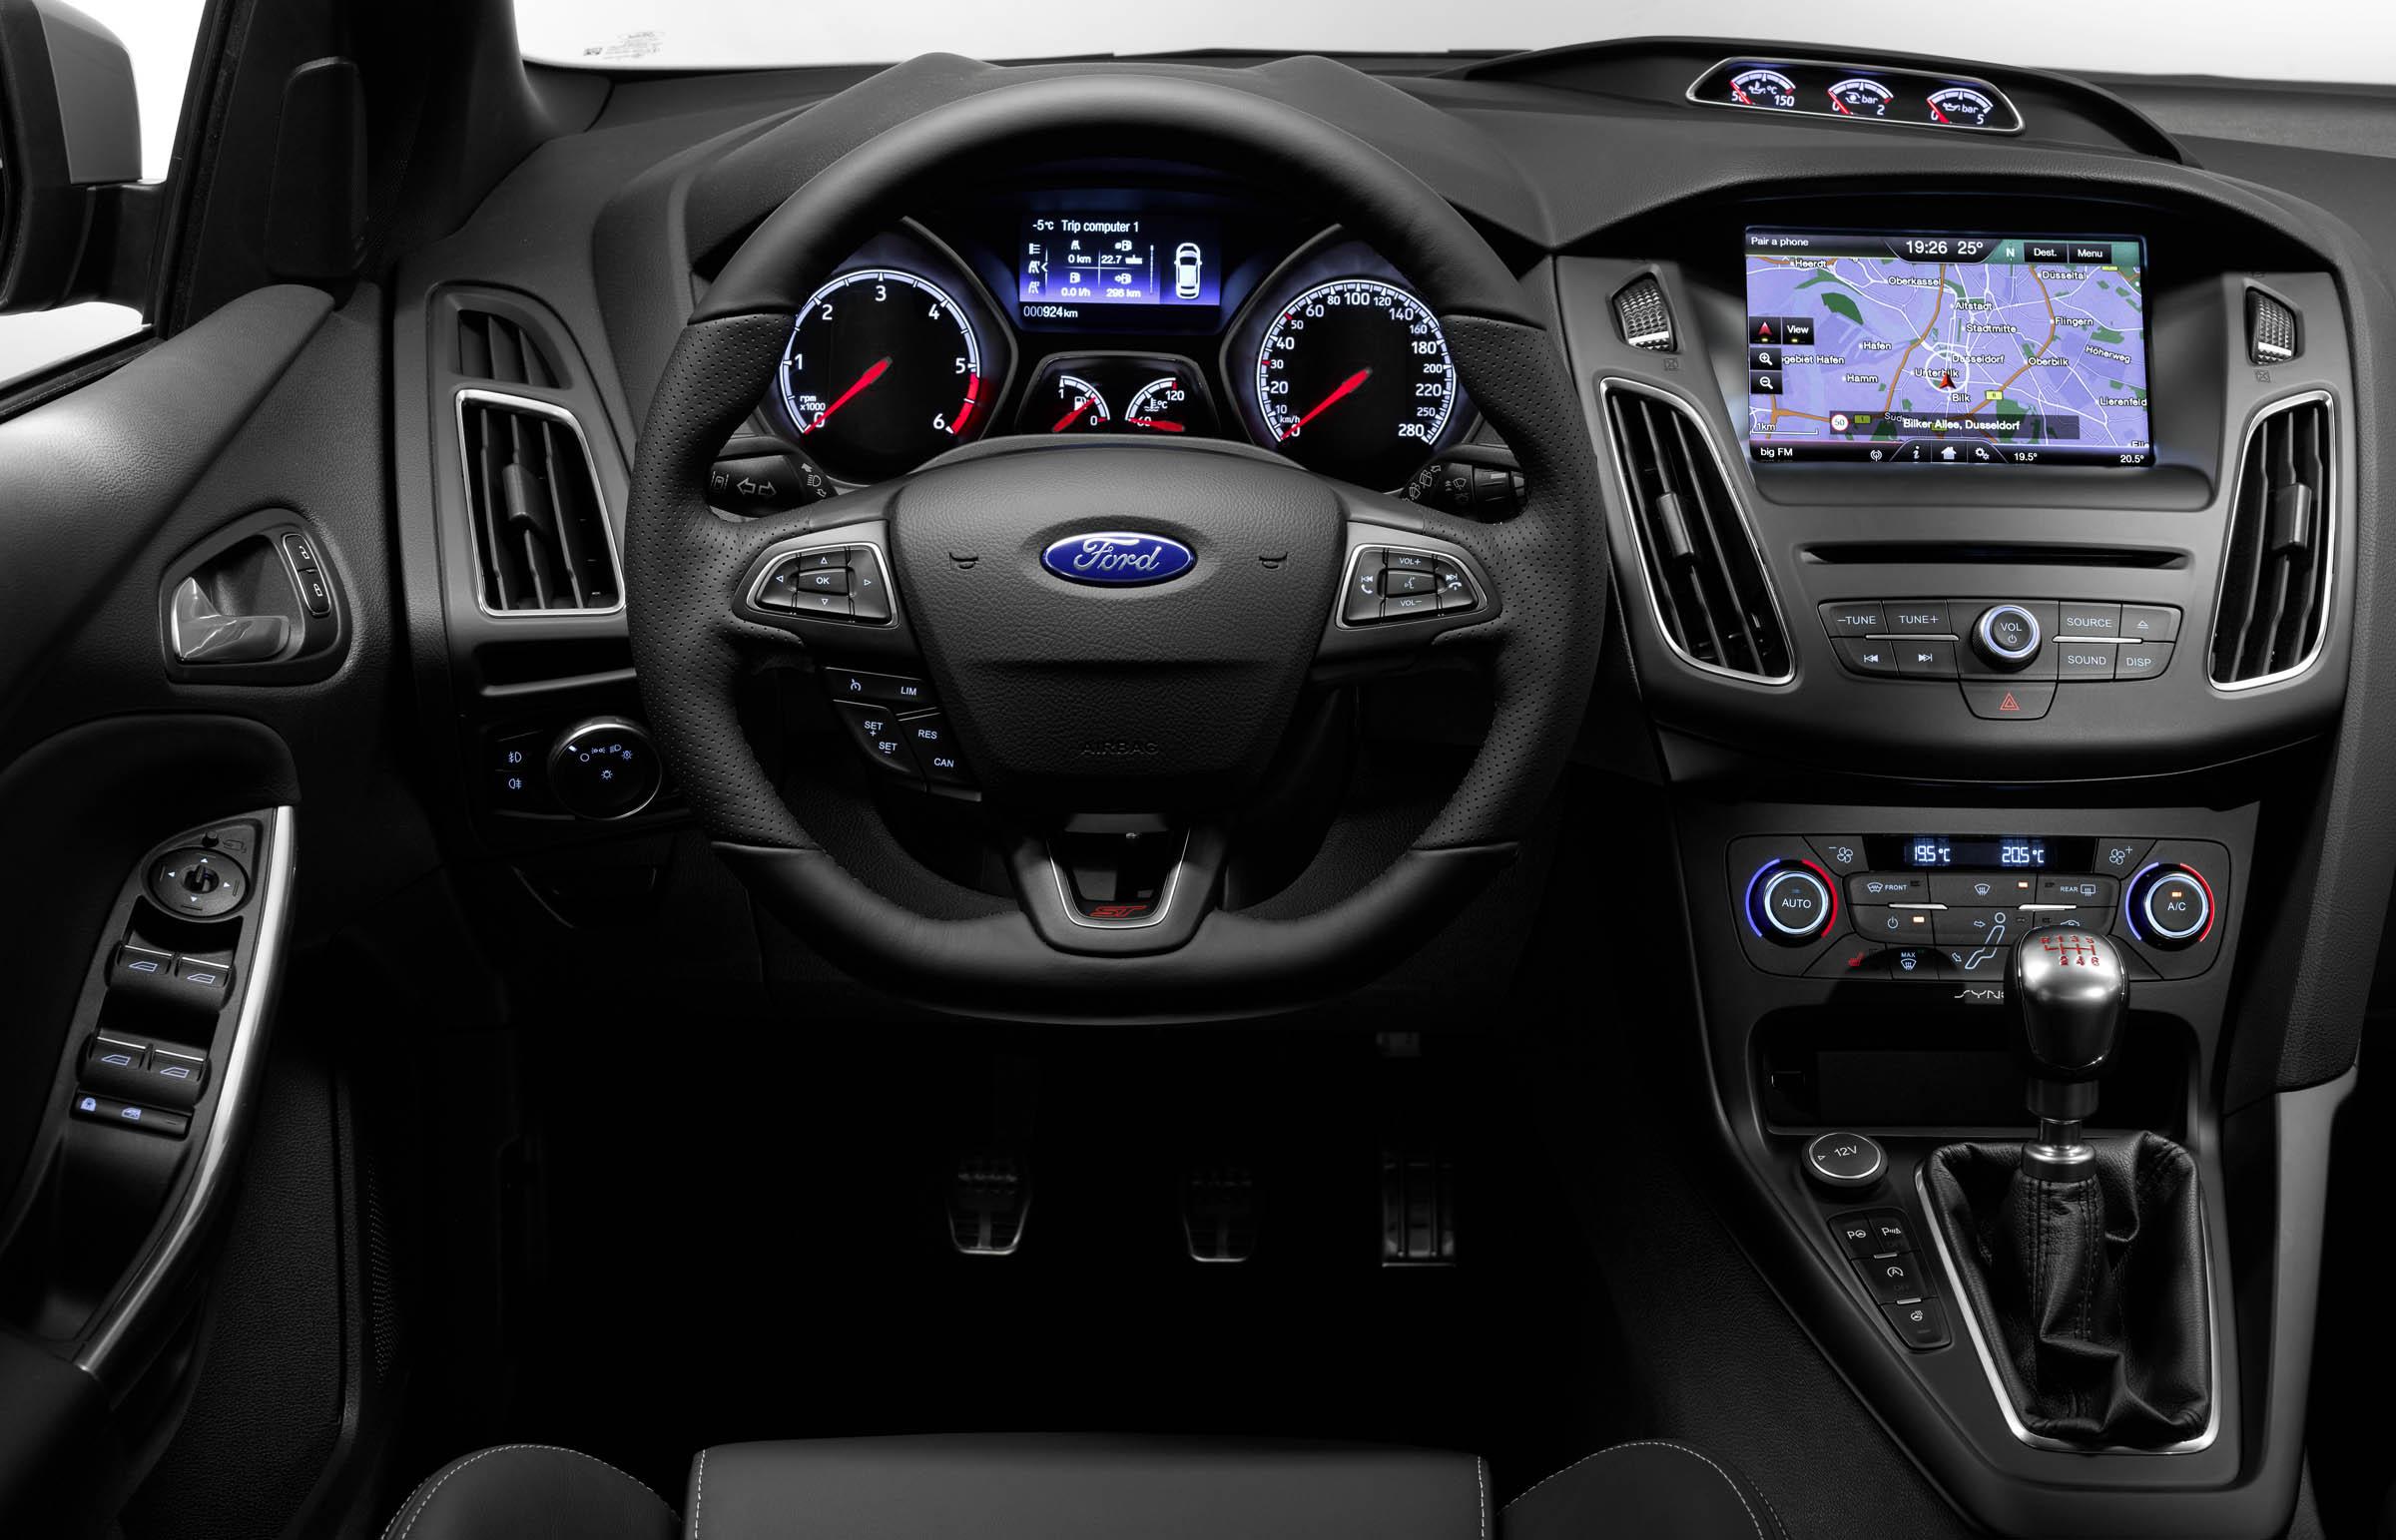 Wallpaper Ford 2015 Ford Focus Coupe Sedan Focus St